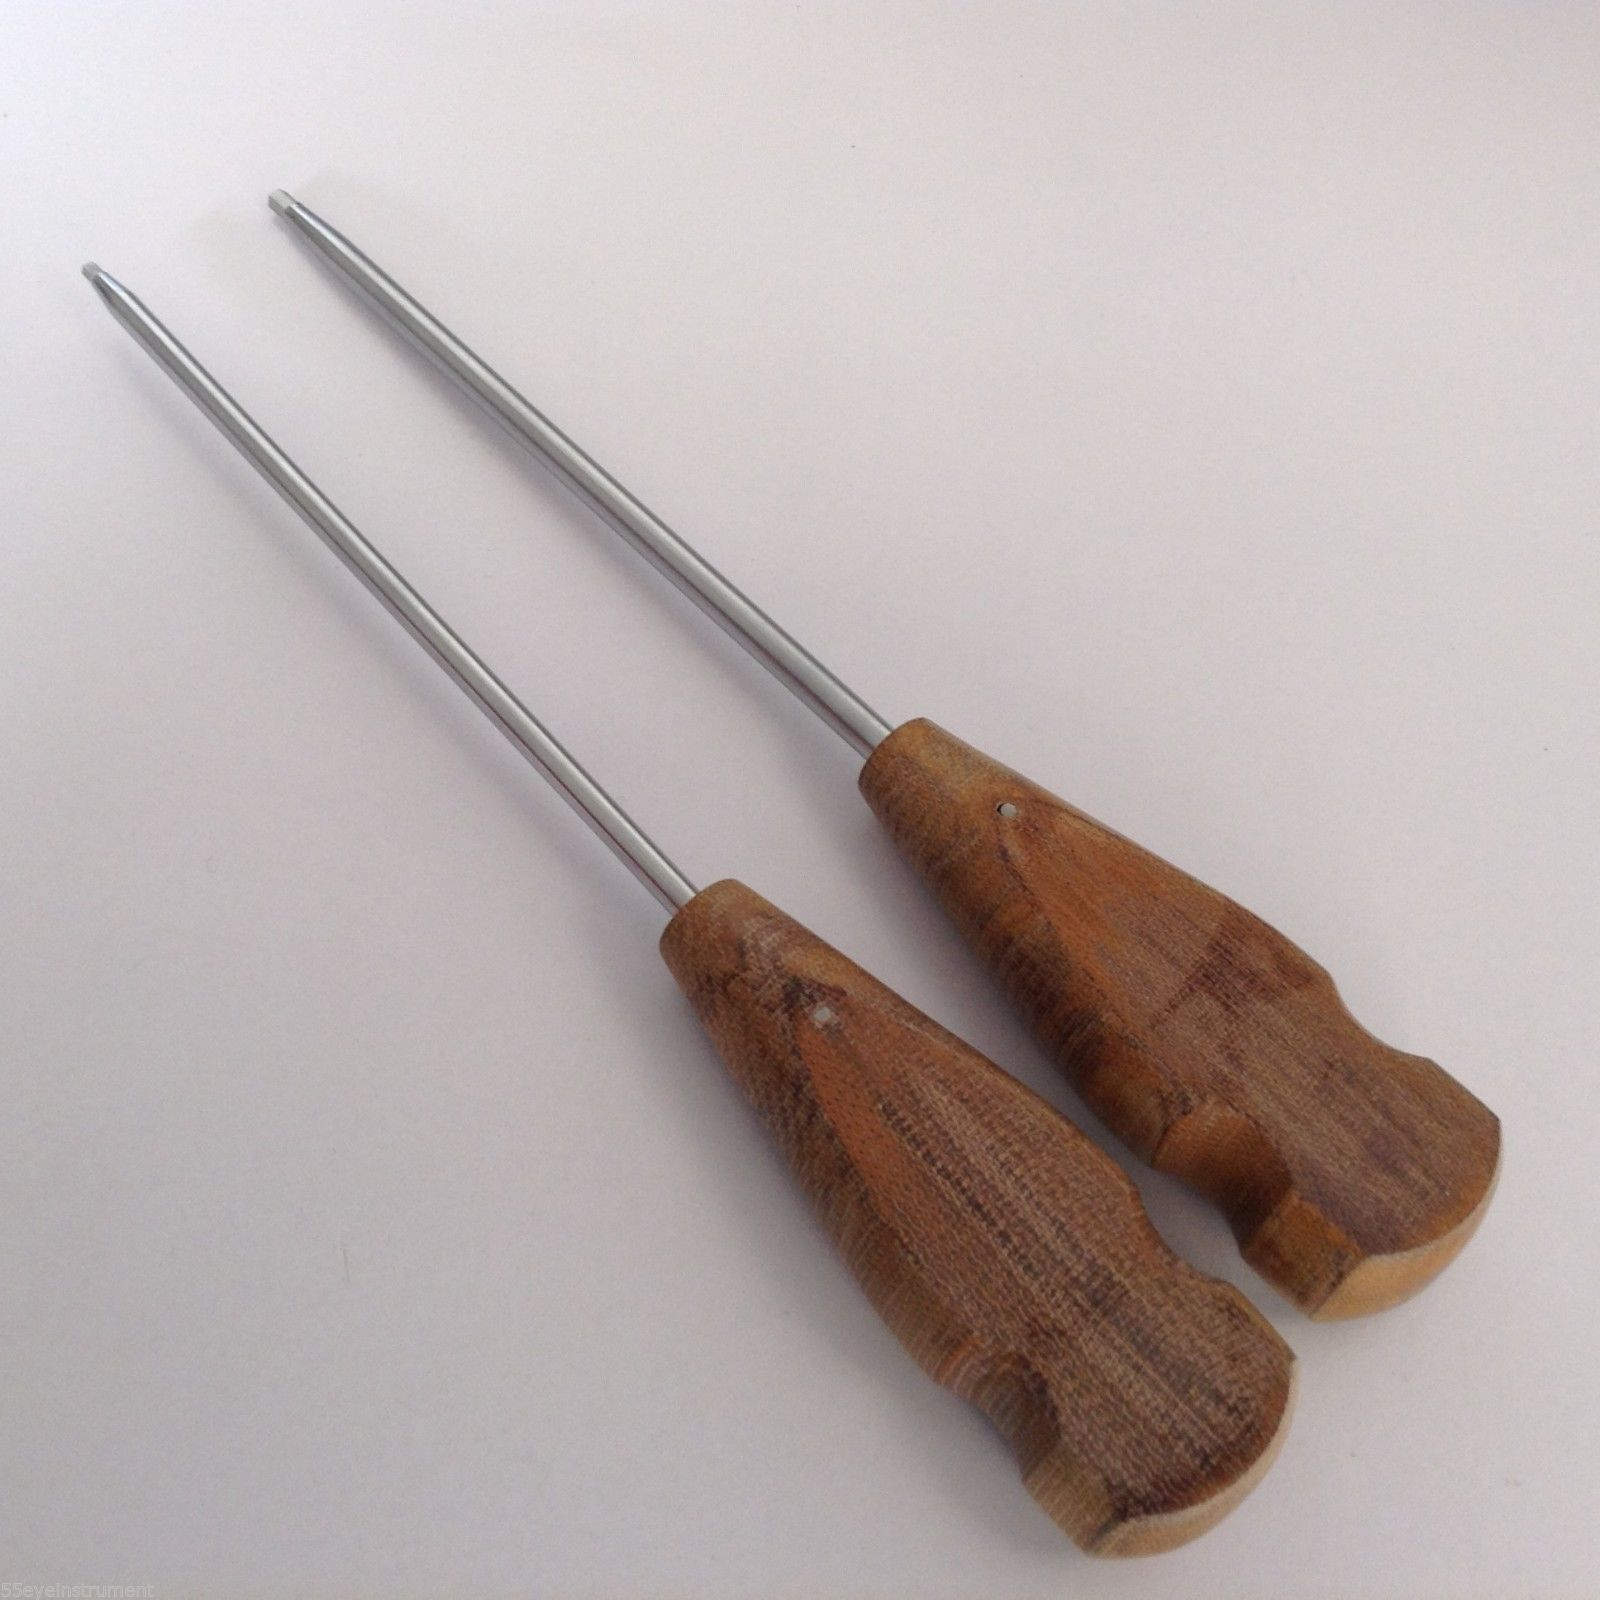 Bone Screw Driver Kit Bone Screw Driver 2.5mm And 3.5mm Orthopedics Instruments